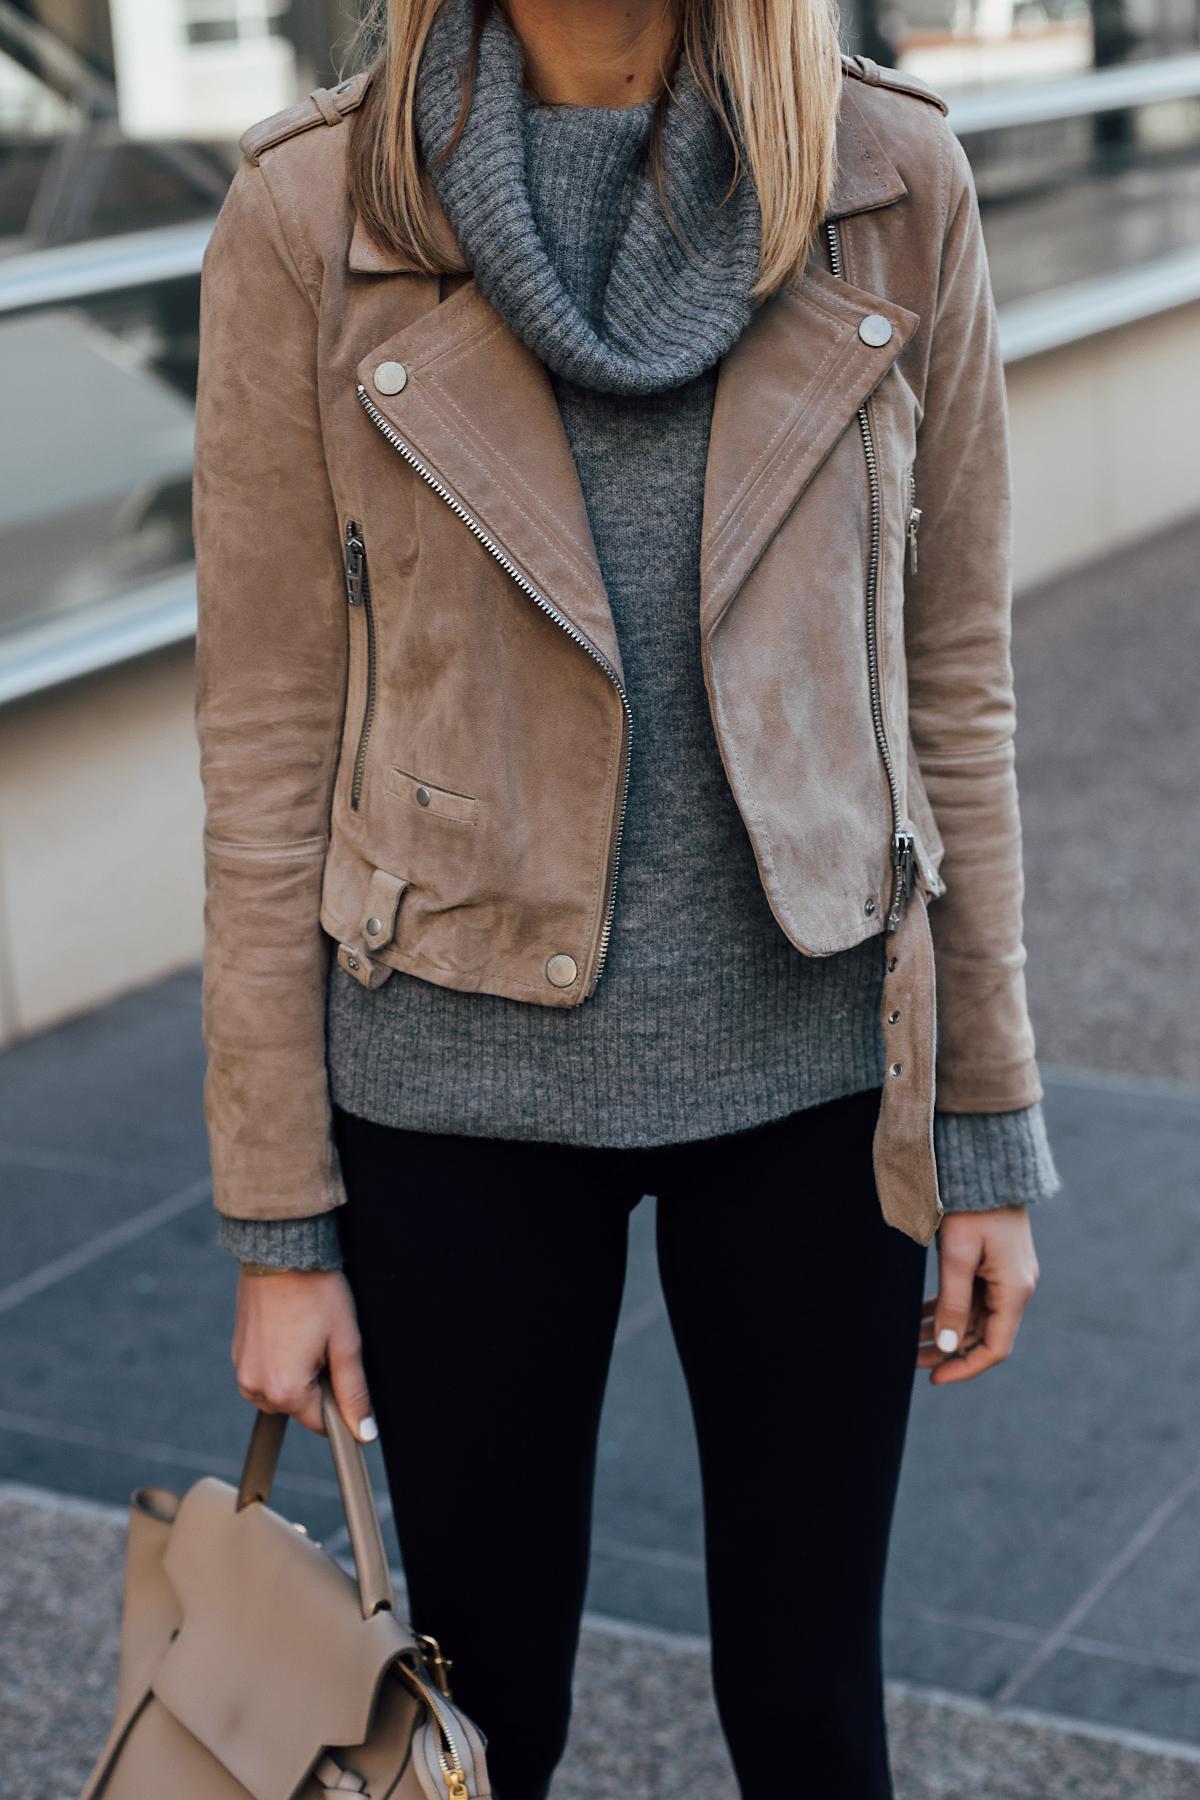 Blonde Woman Wearing Blanknyc Tan Suede Moto Jacket Grey Turtleneck Sweater Black Leggings Fashion Jackson San Diego Fashion Blogger Street Style